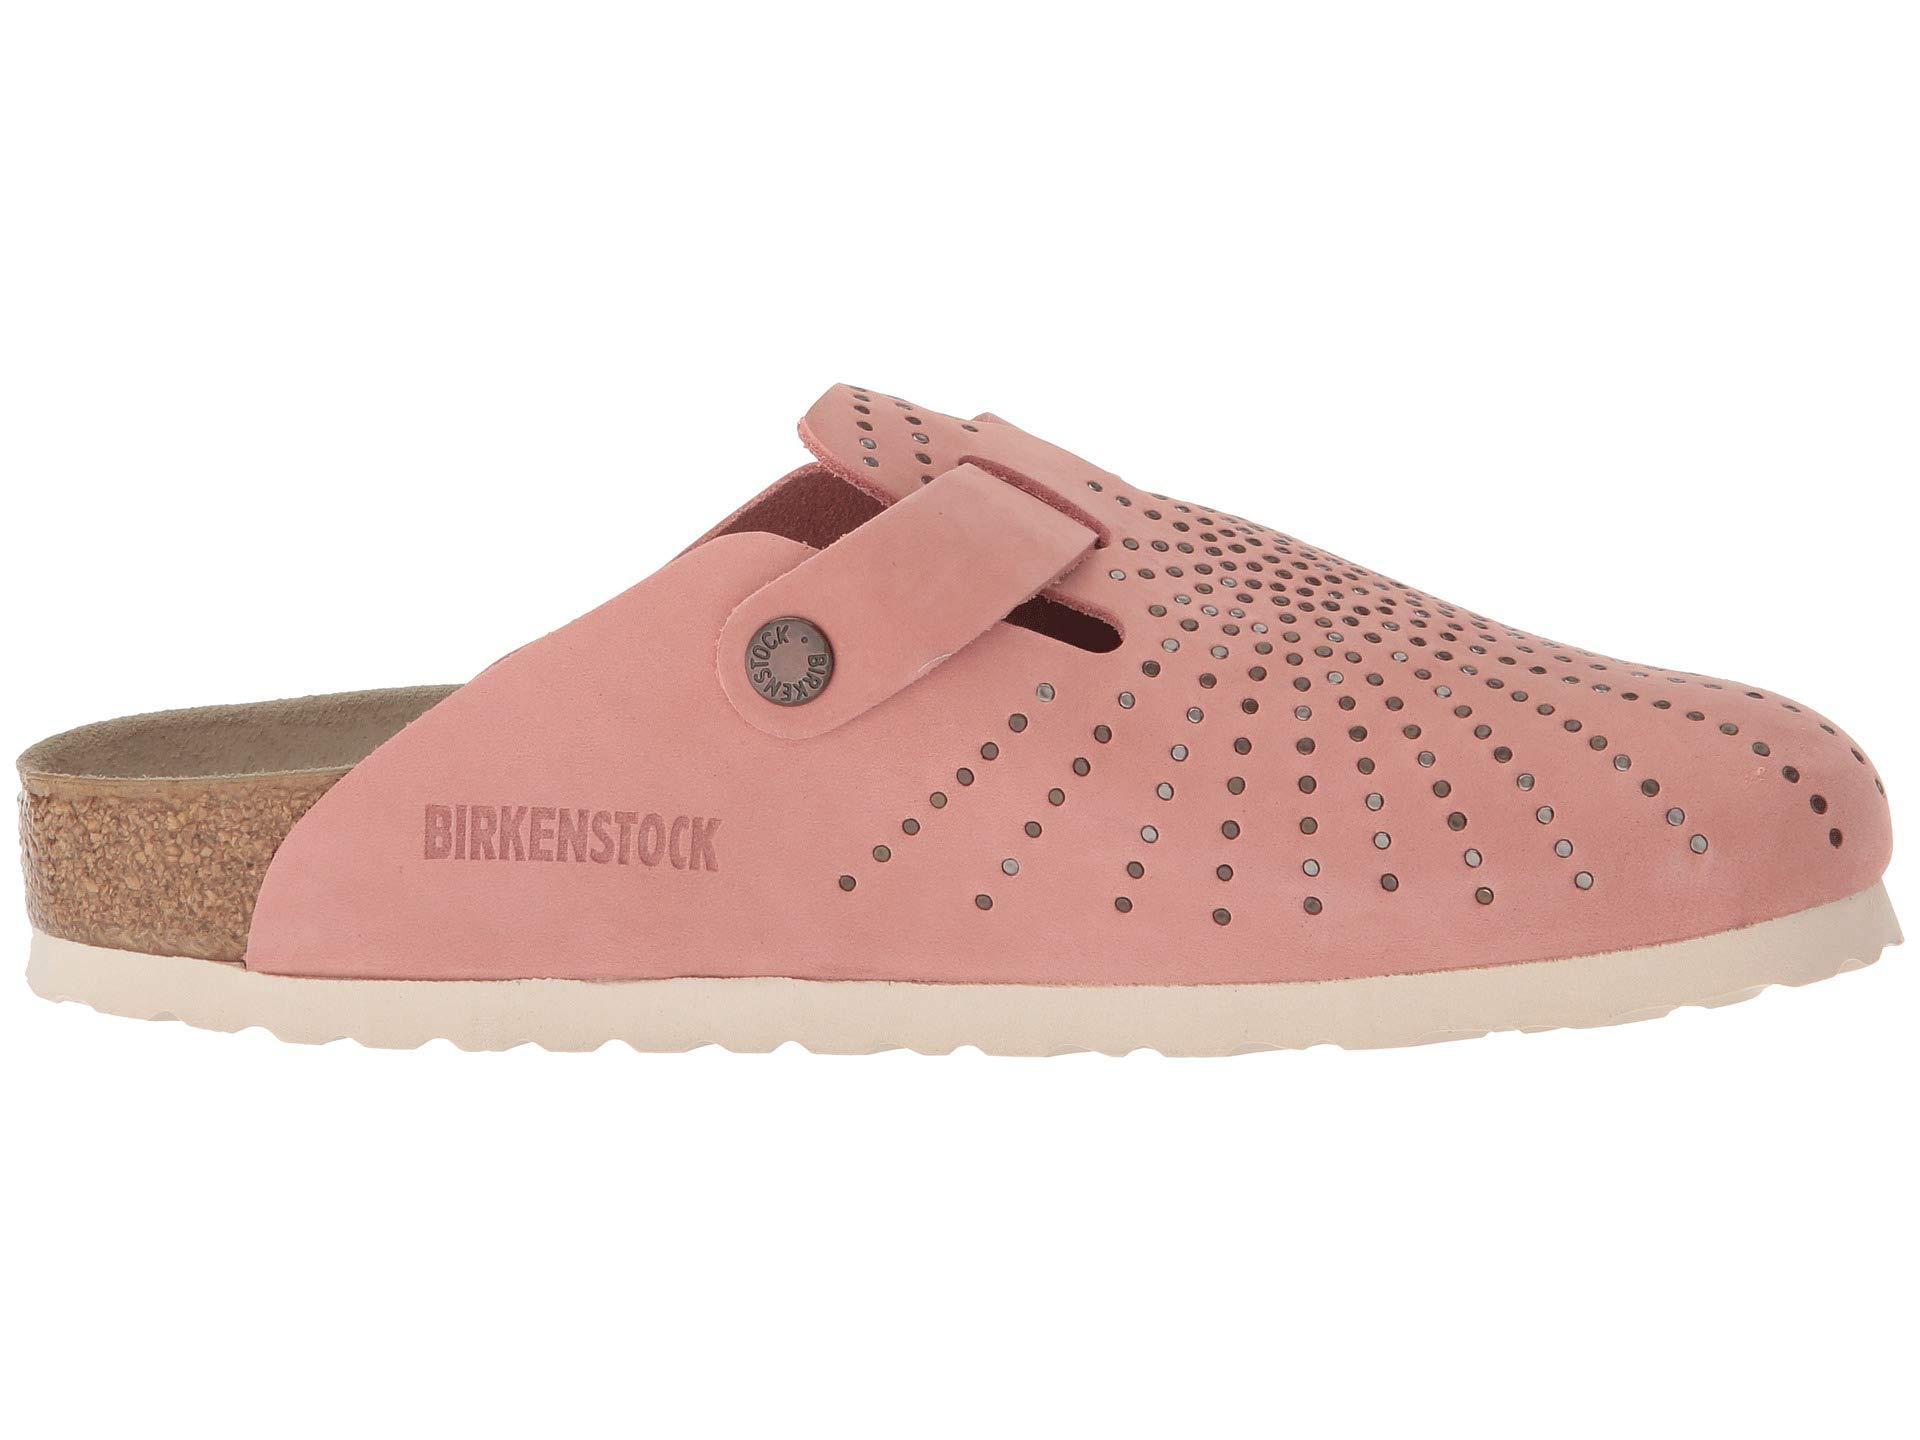 ae3a5556ba752b Lyst - Birkenstock Boston in Pink - Save 14%